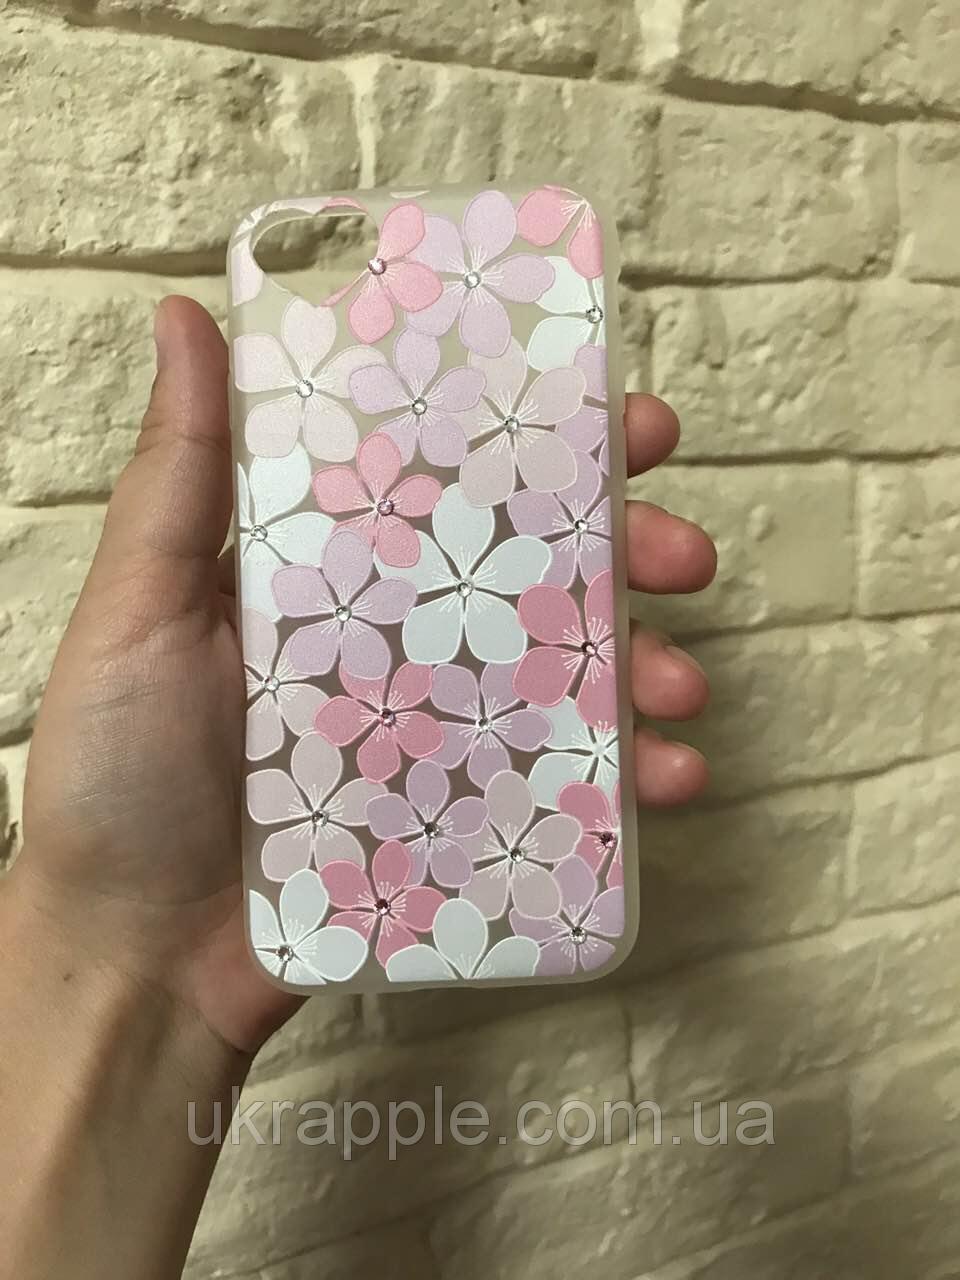 Чехолна iPhone6 plus/6splusсцветамиистразами